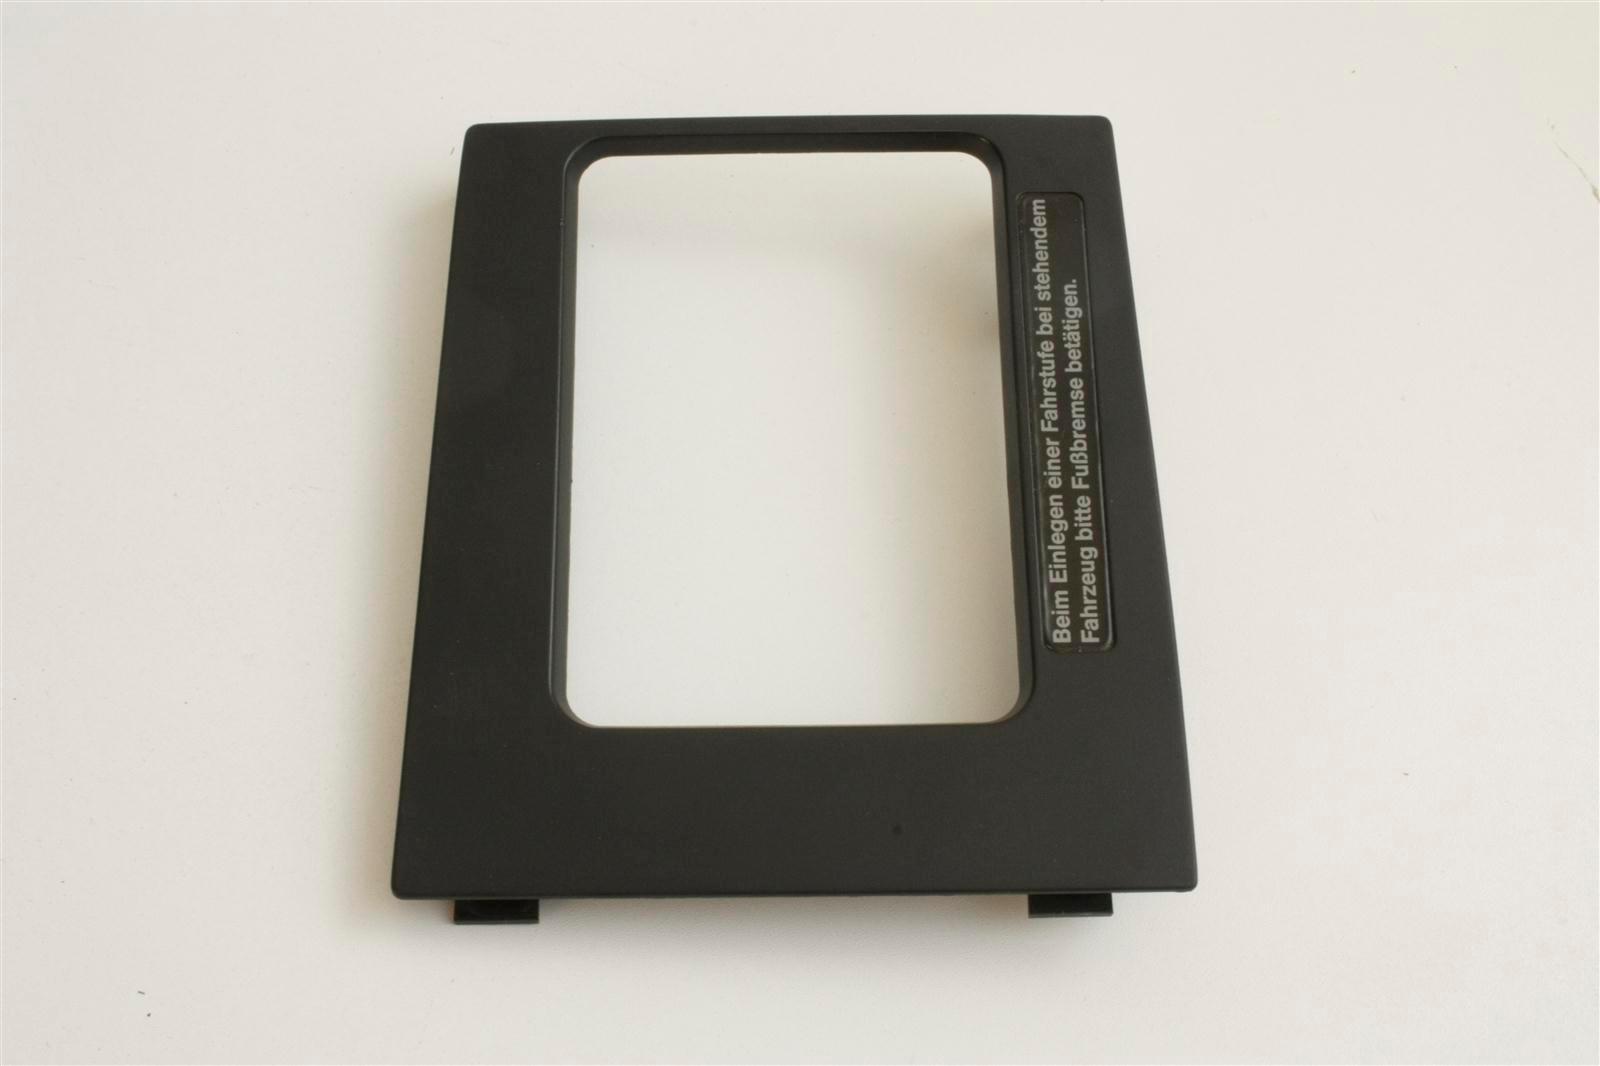 Audi 100/S4/A6/S6 C4 Blende Automatikgetriebe schwarz 4A0863269D 4A0863269C